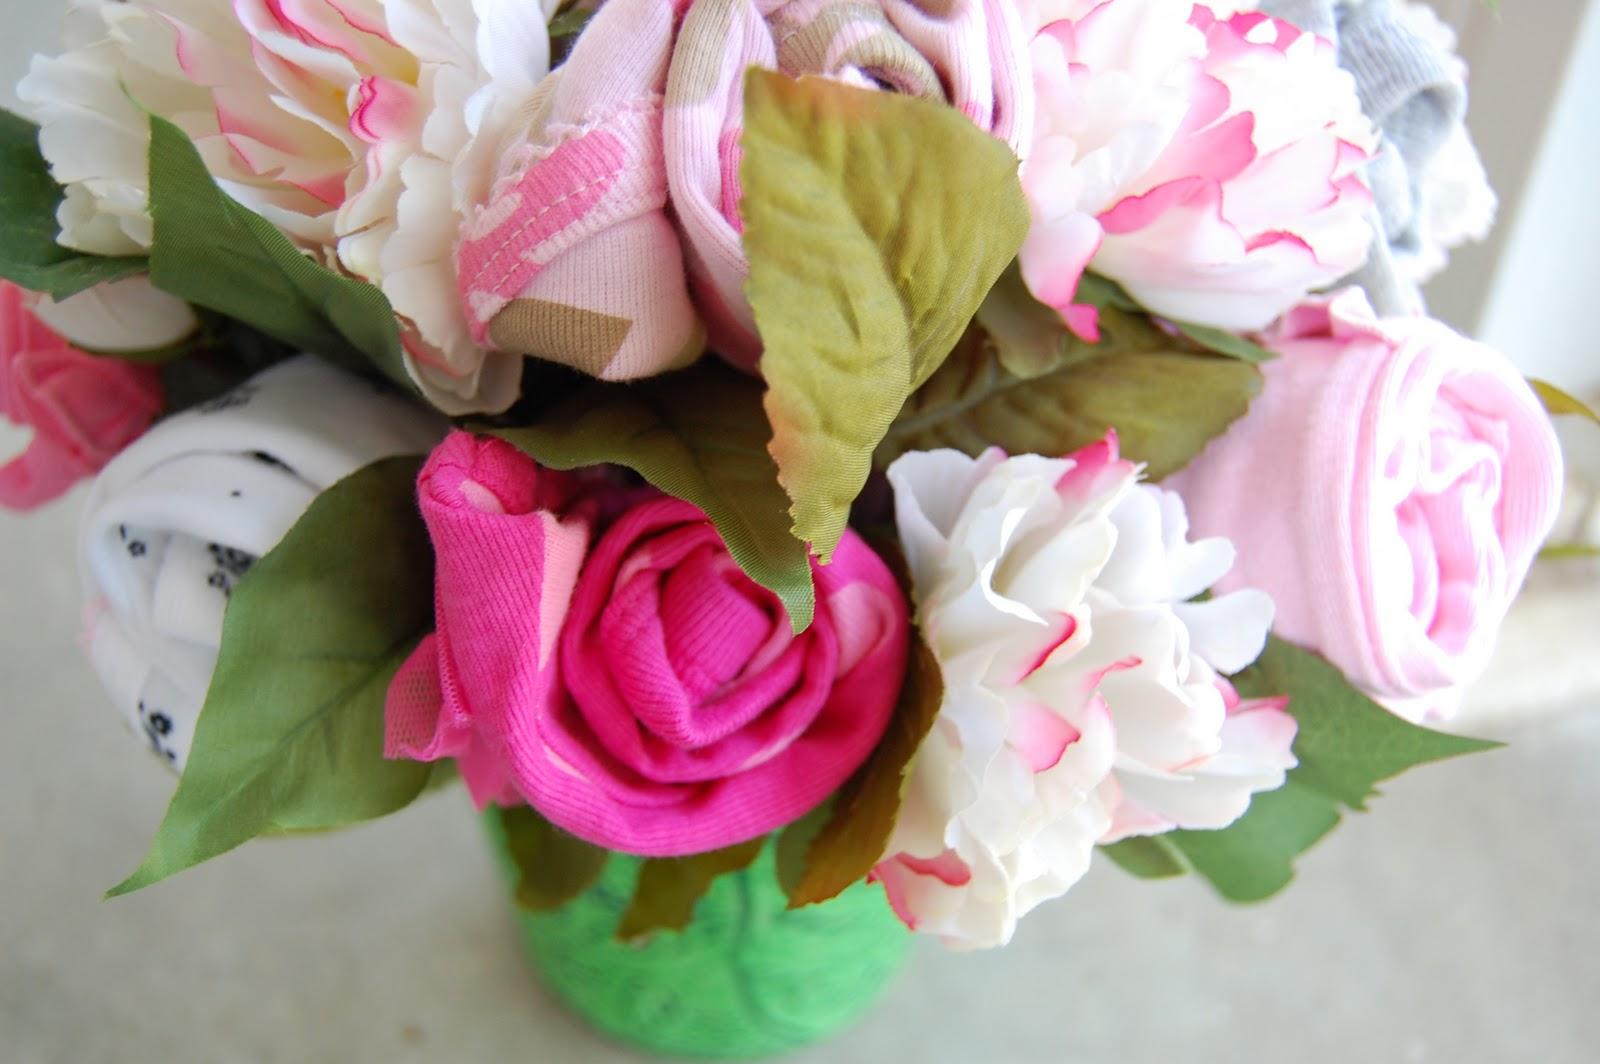 Prettysweet baby shower onesie bouquets baby shower onesie bouquets izmirmasajfo